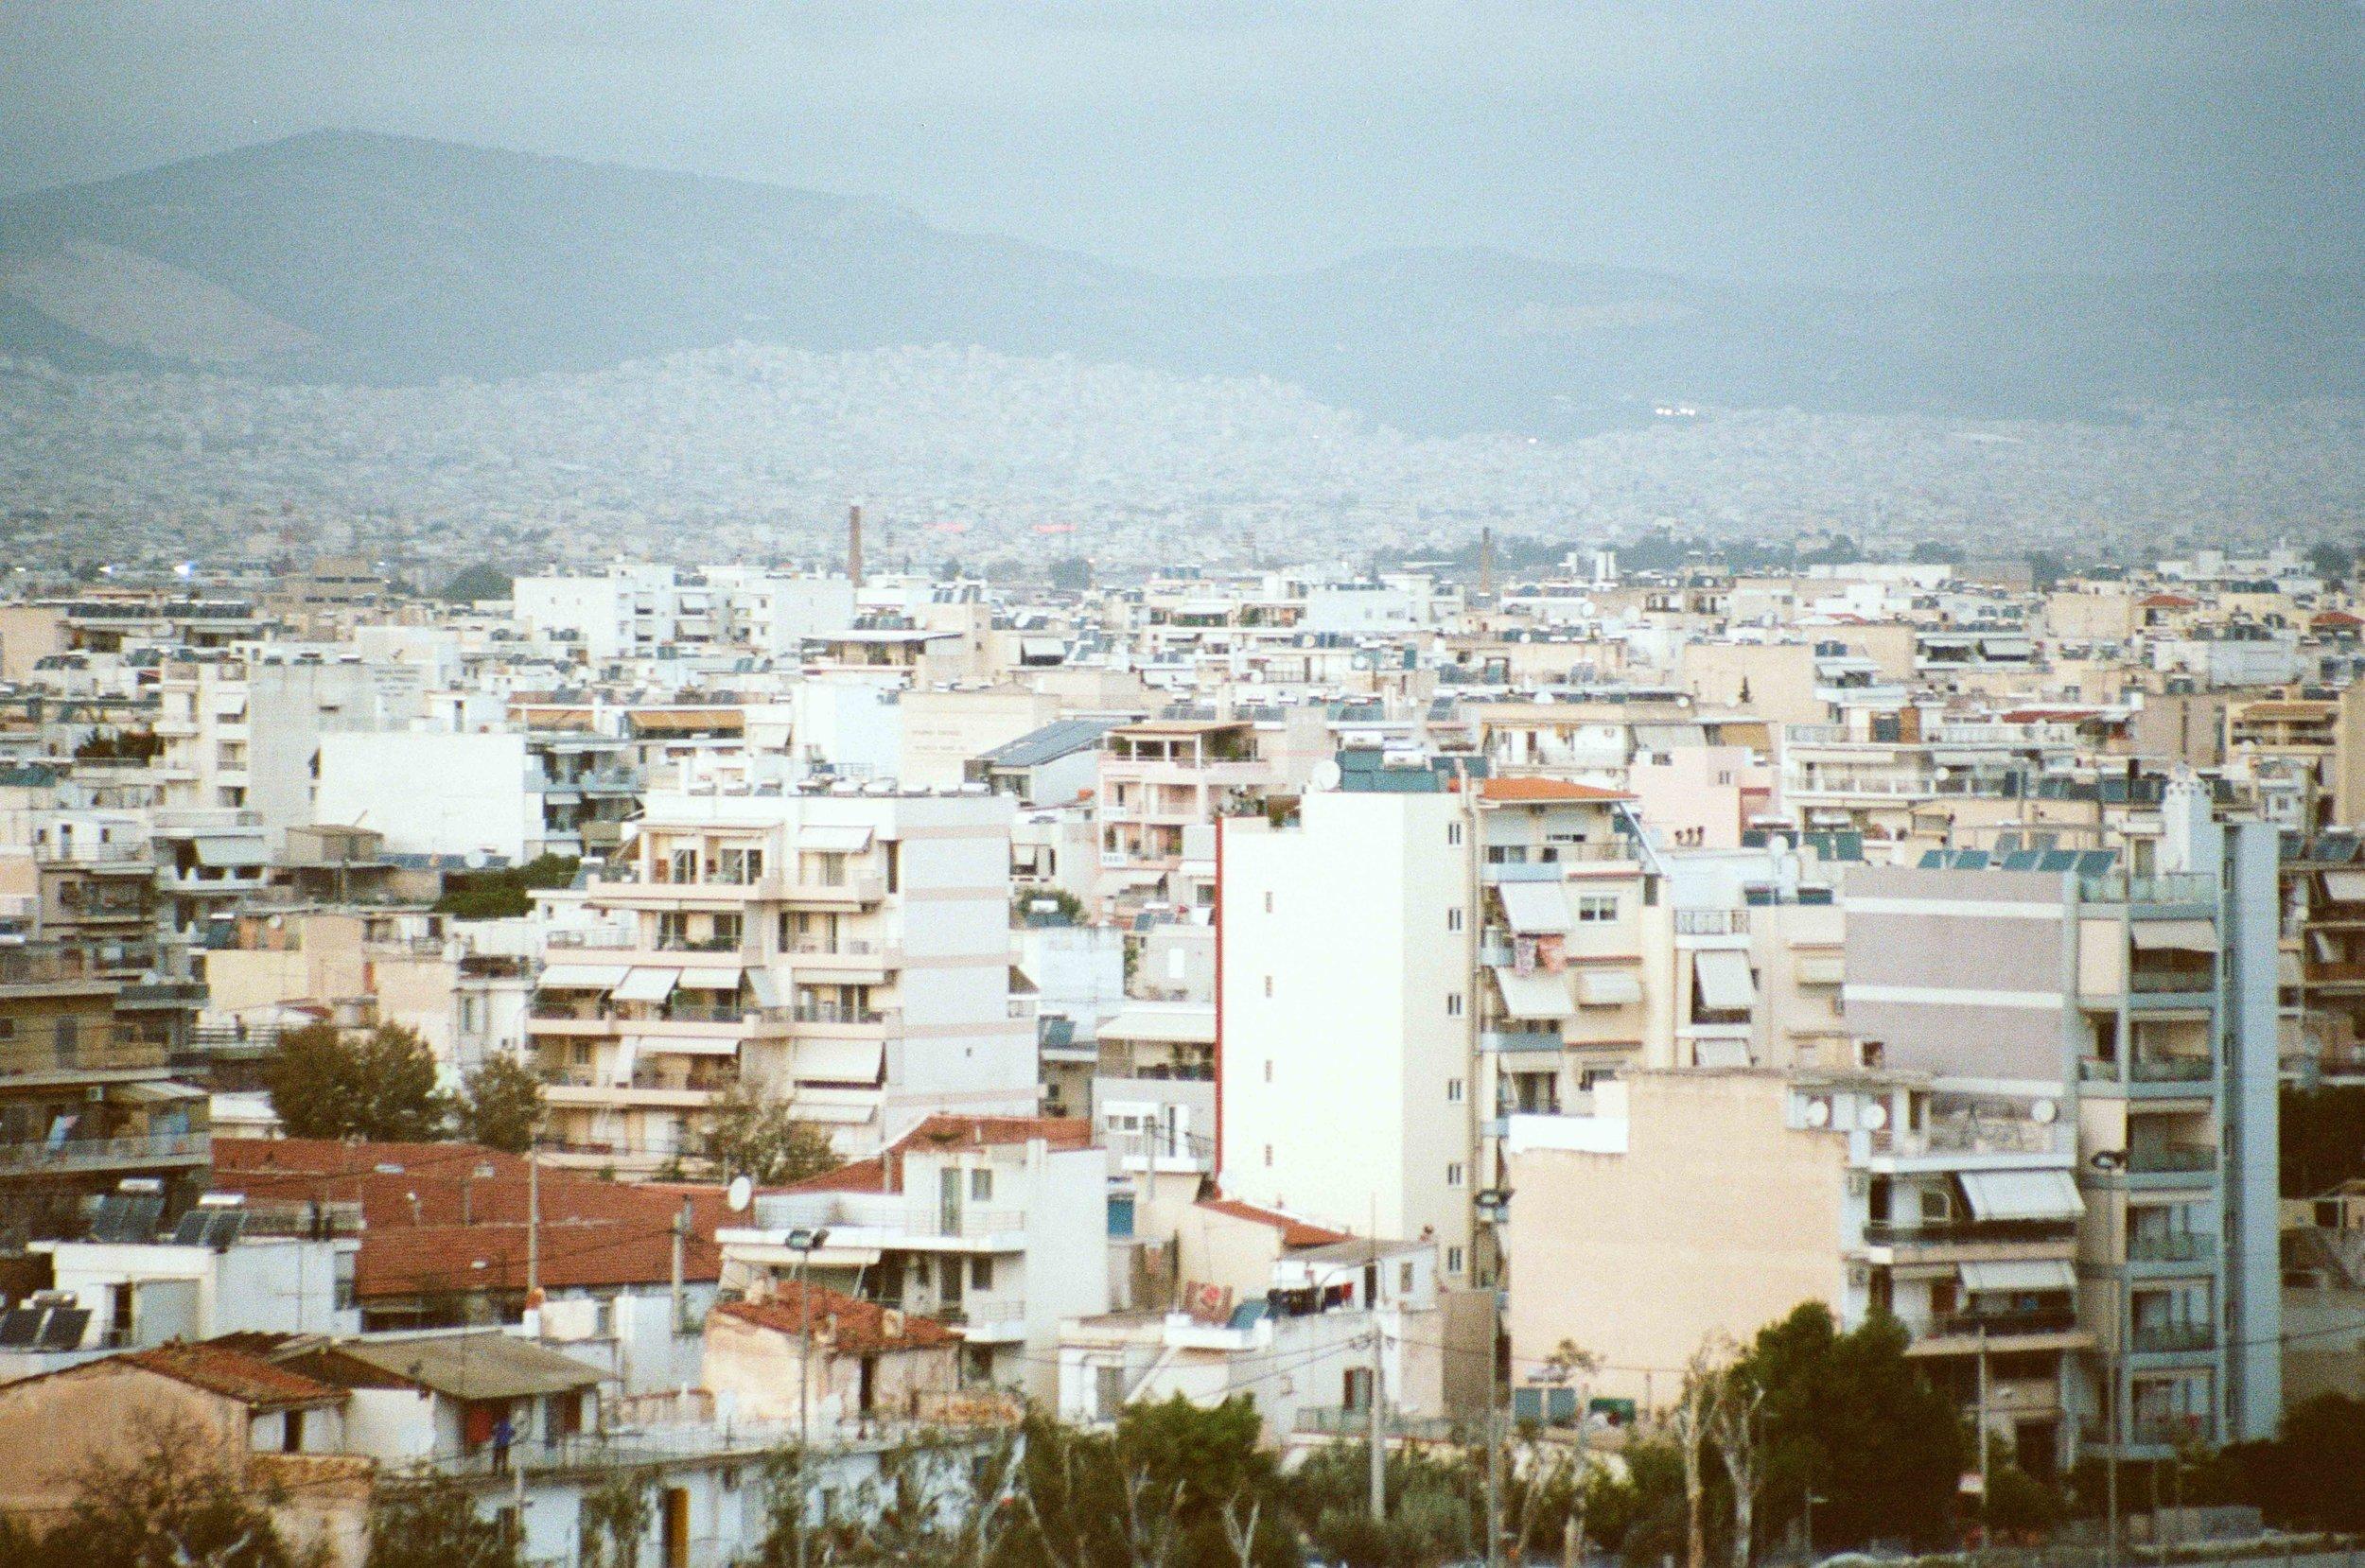 20180202-Athens 2.jpg